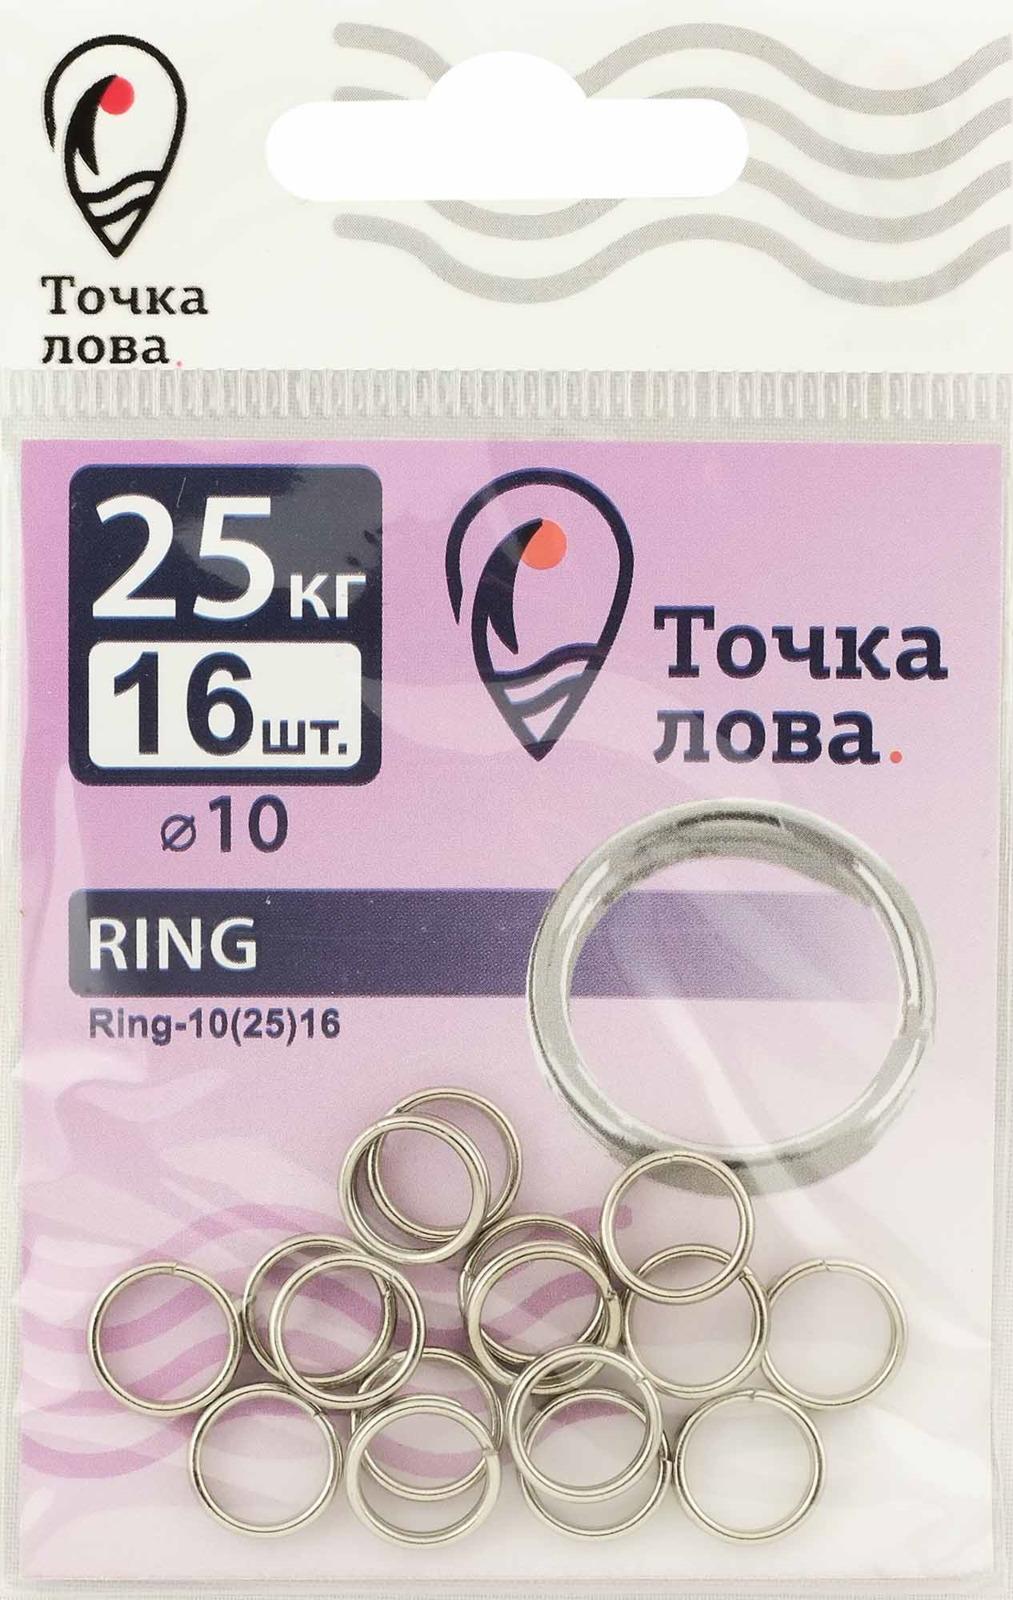 Аксессуар для рыбалки Точка Лова Заводное кольцо, Ring-10(25), 16 шт